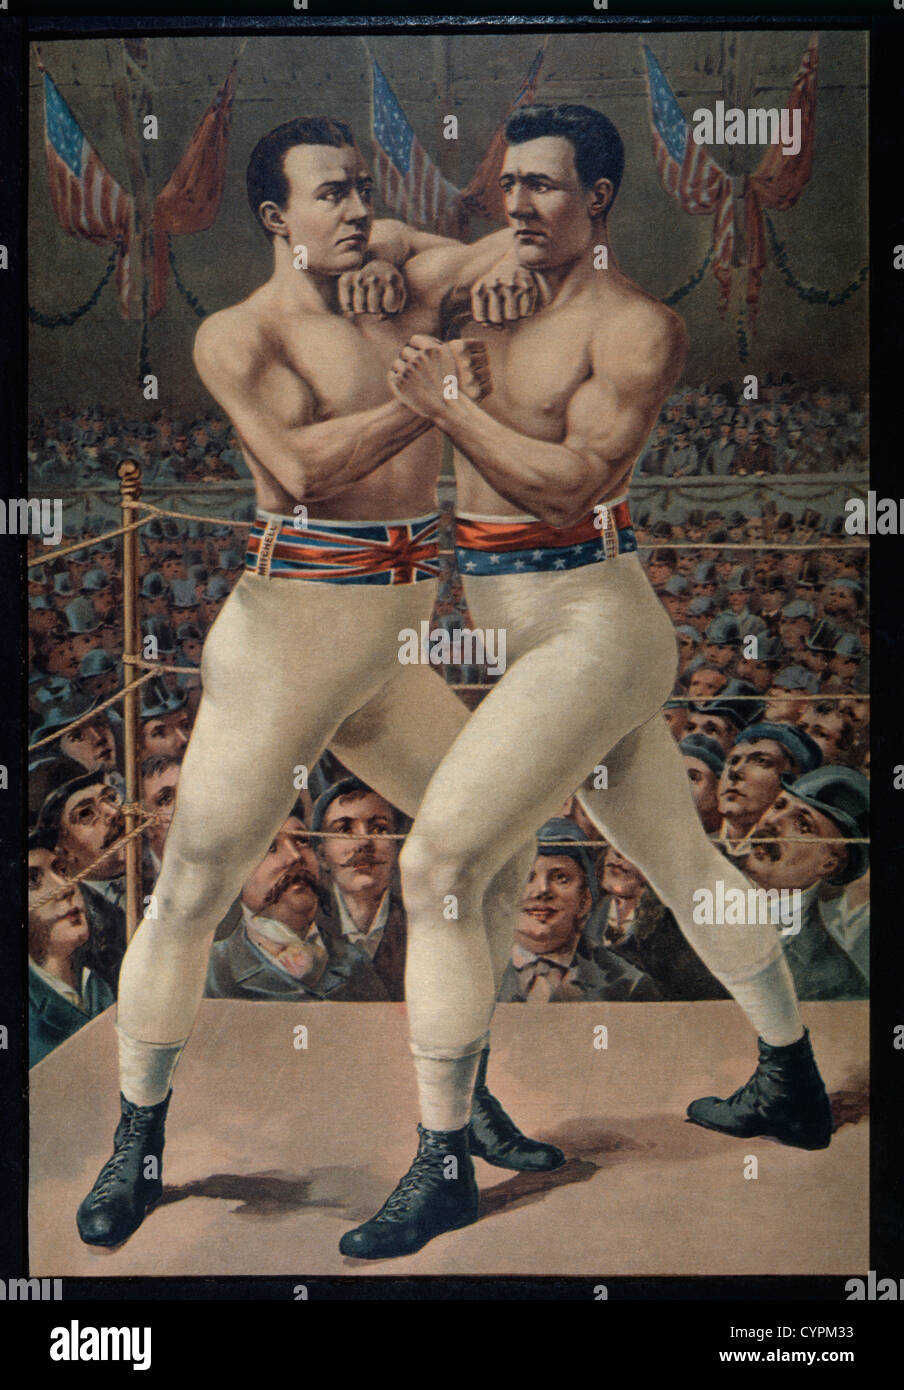 Charlie Mitchell vs. James Corbett de Boxeo, Jacksonville, Florida, EE.UU., litografía, 1893 Imagen De Stock